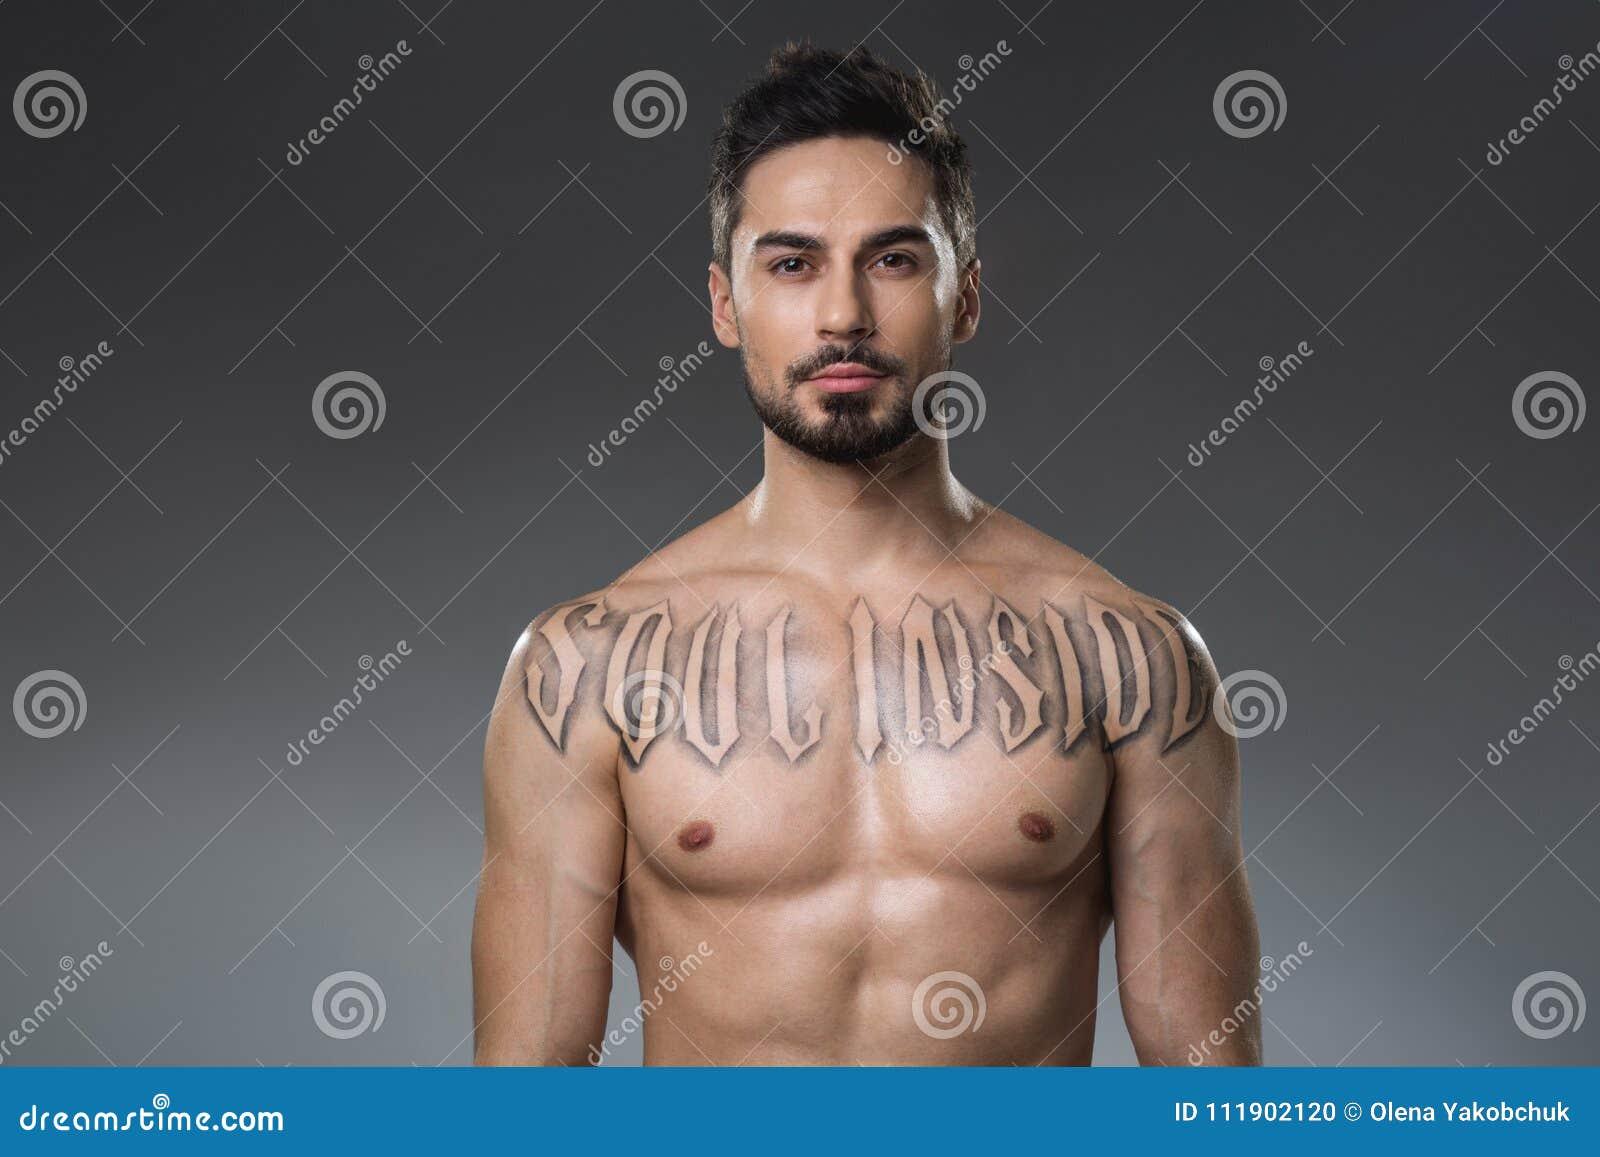 Tattoo Stock Photos: Download 735 Royalty Free Photos